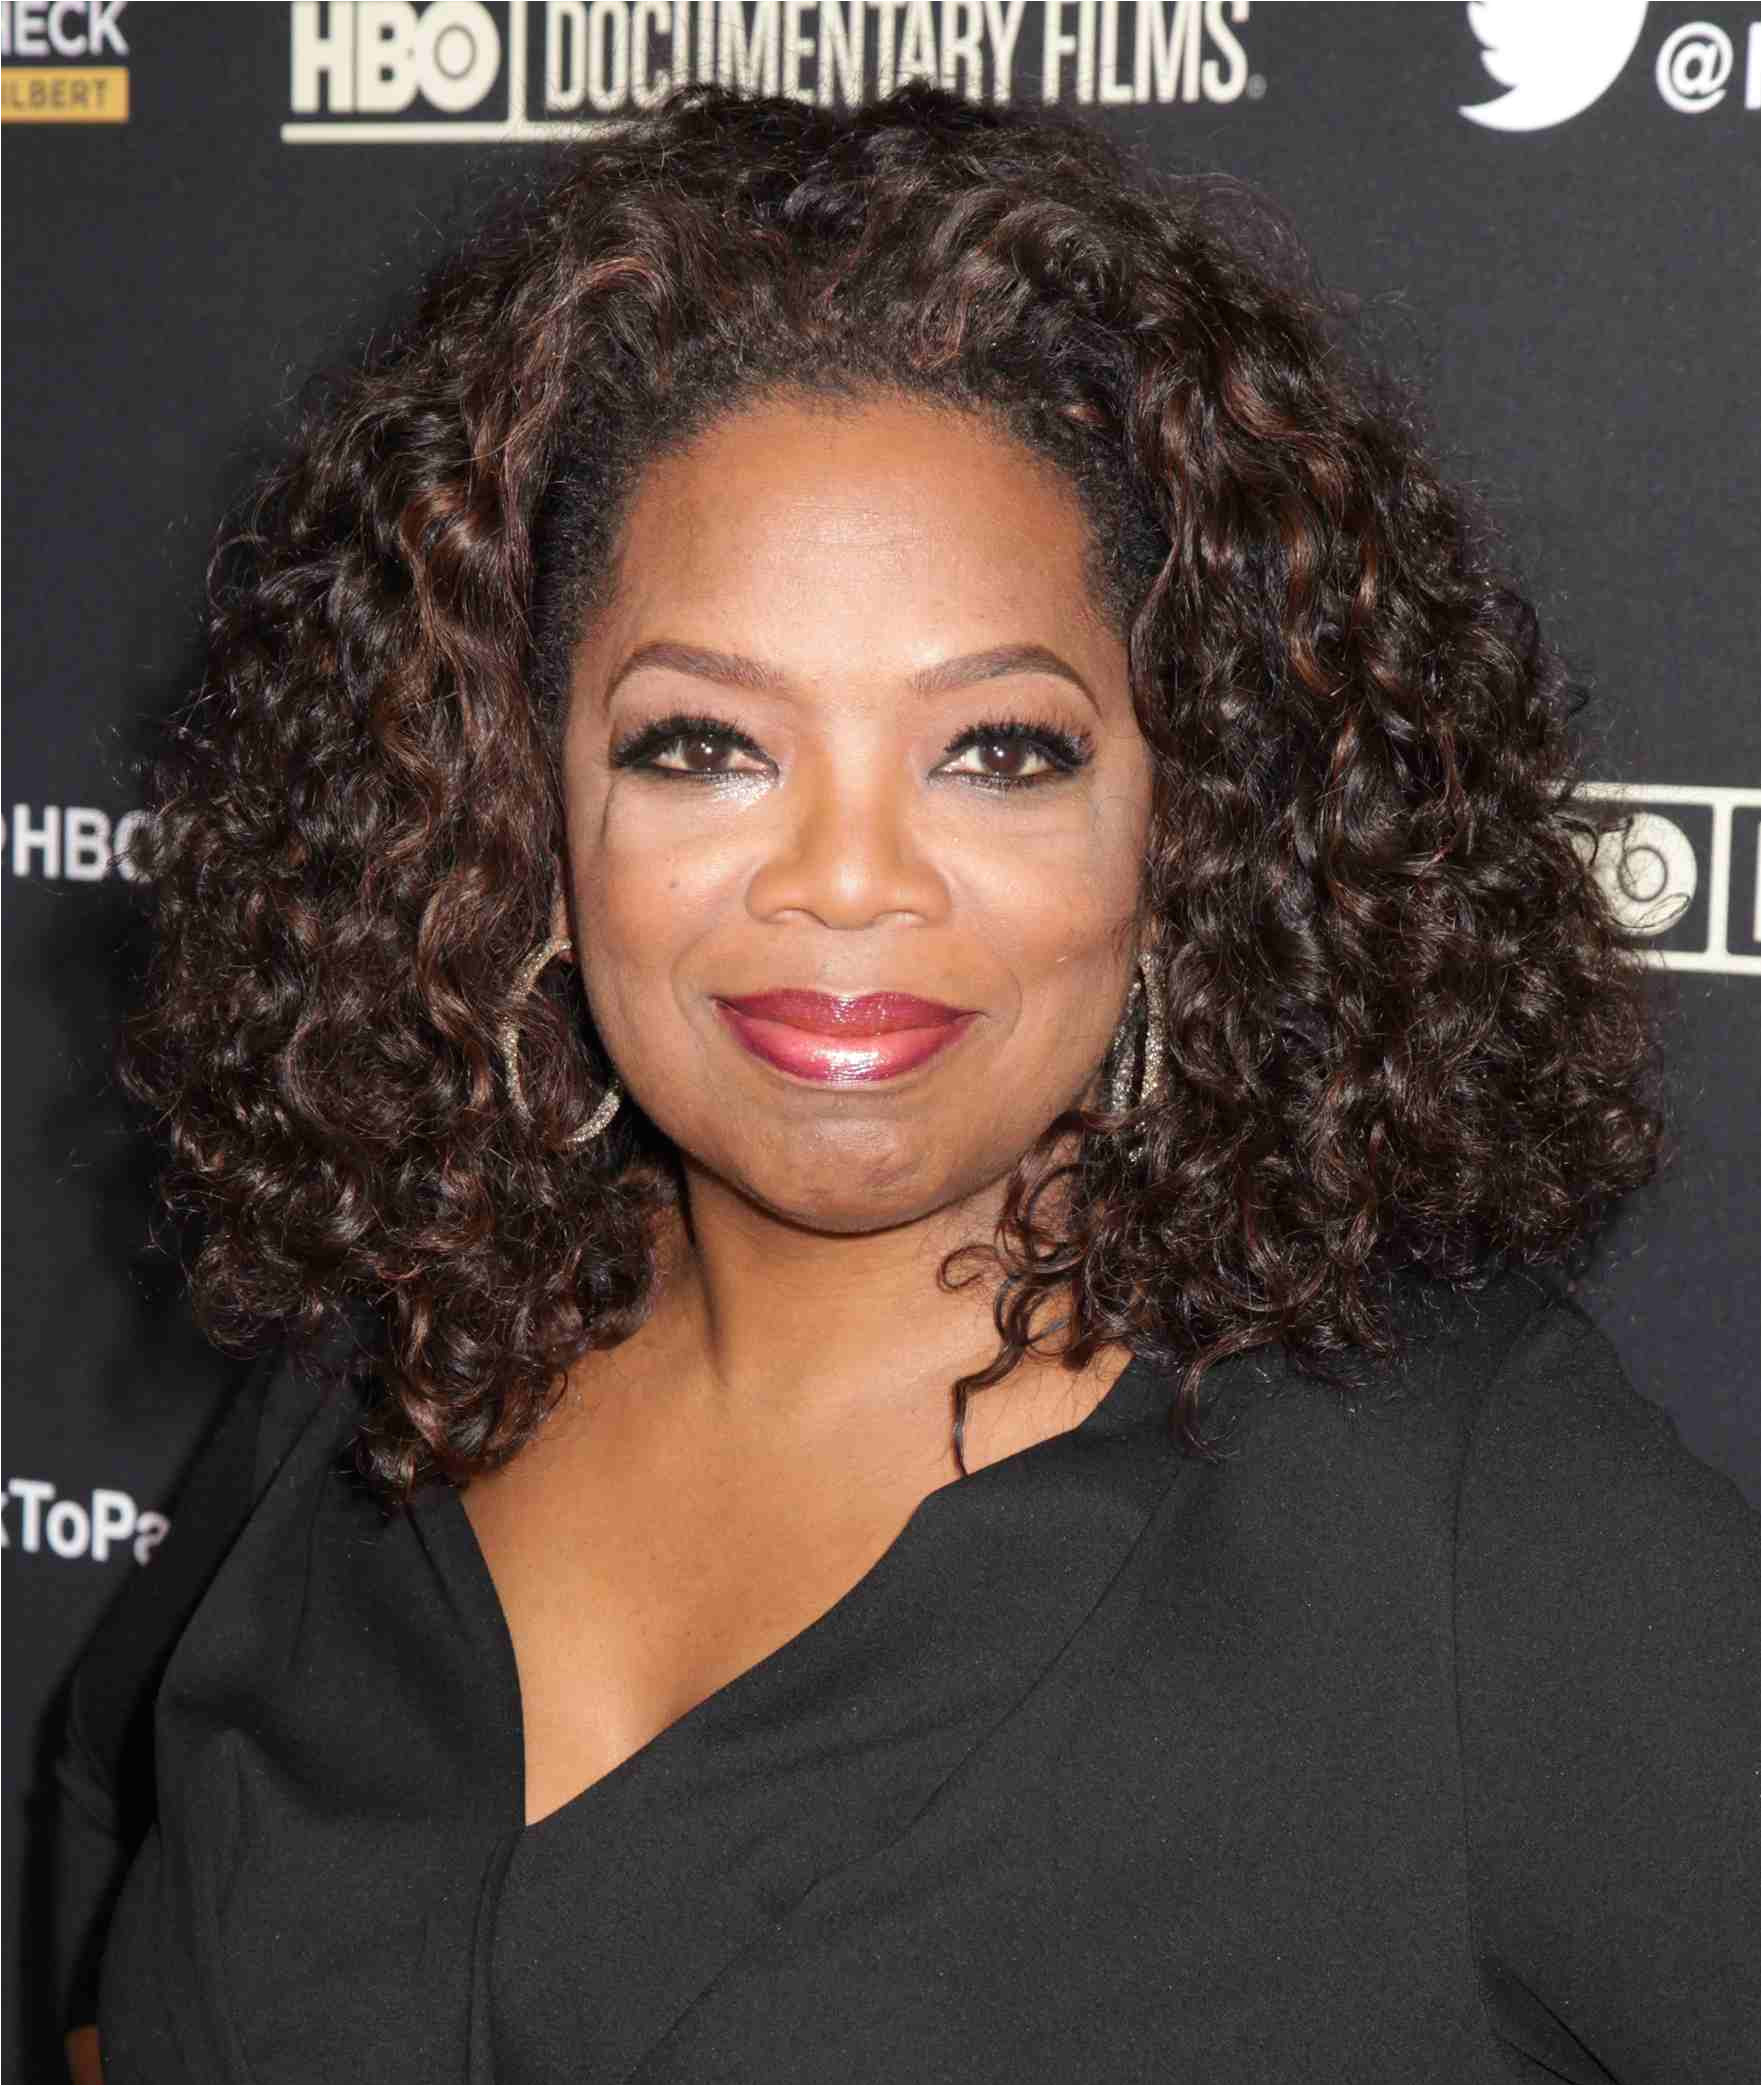 oprah winfrey hairstyles 56a0869c5f9b58eba4b146e3